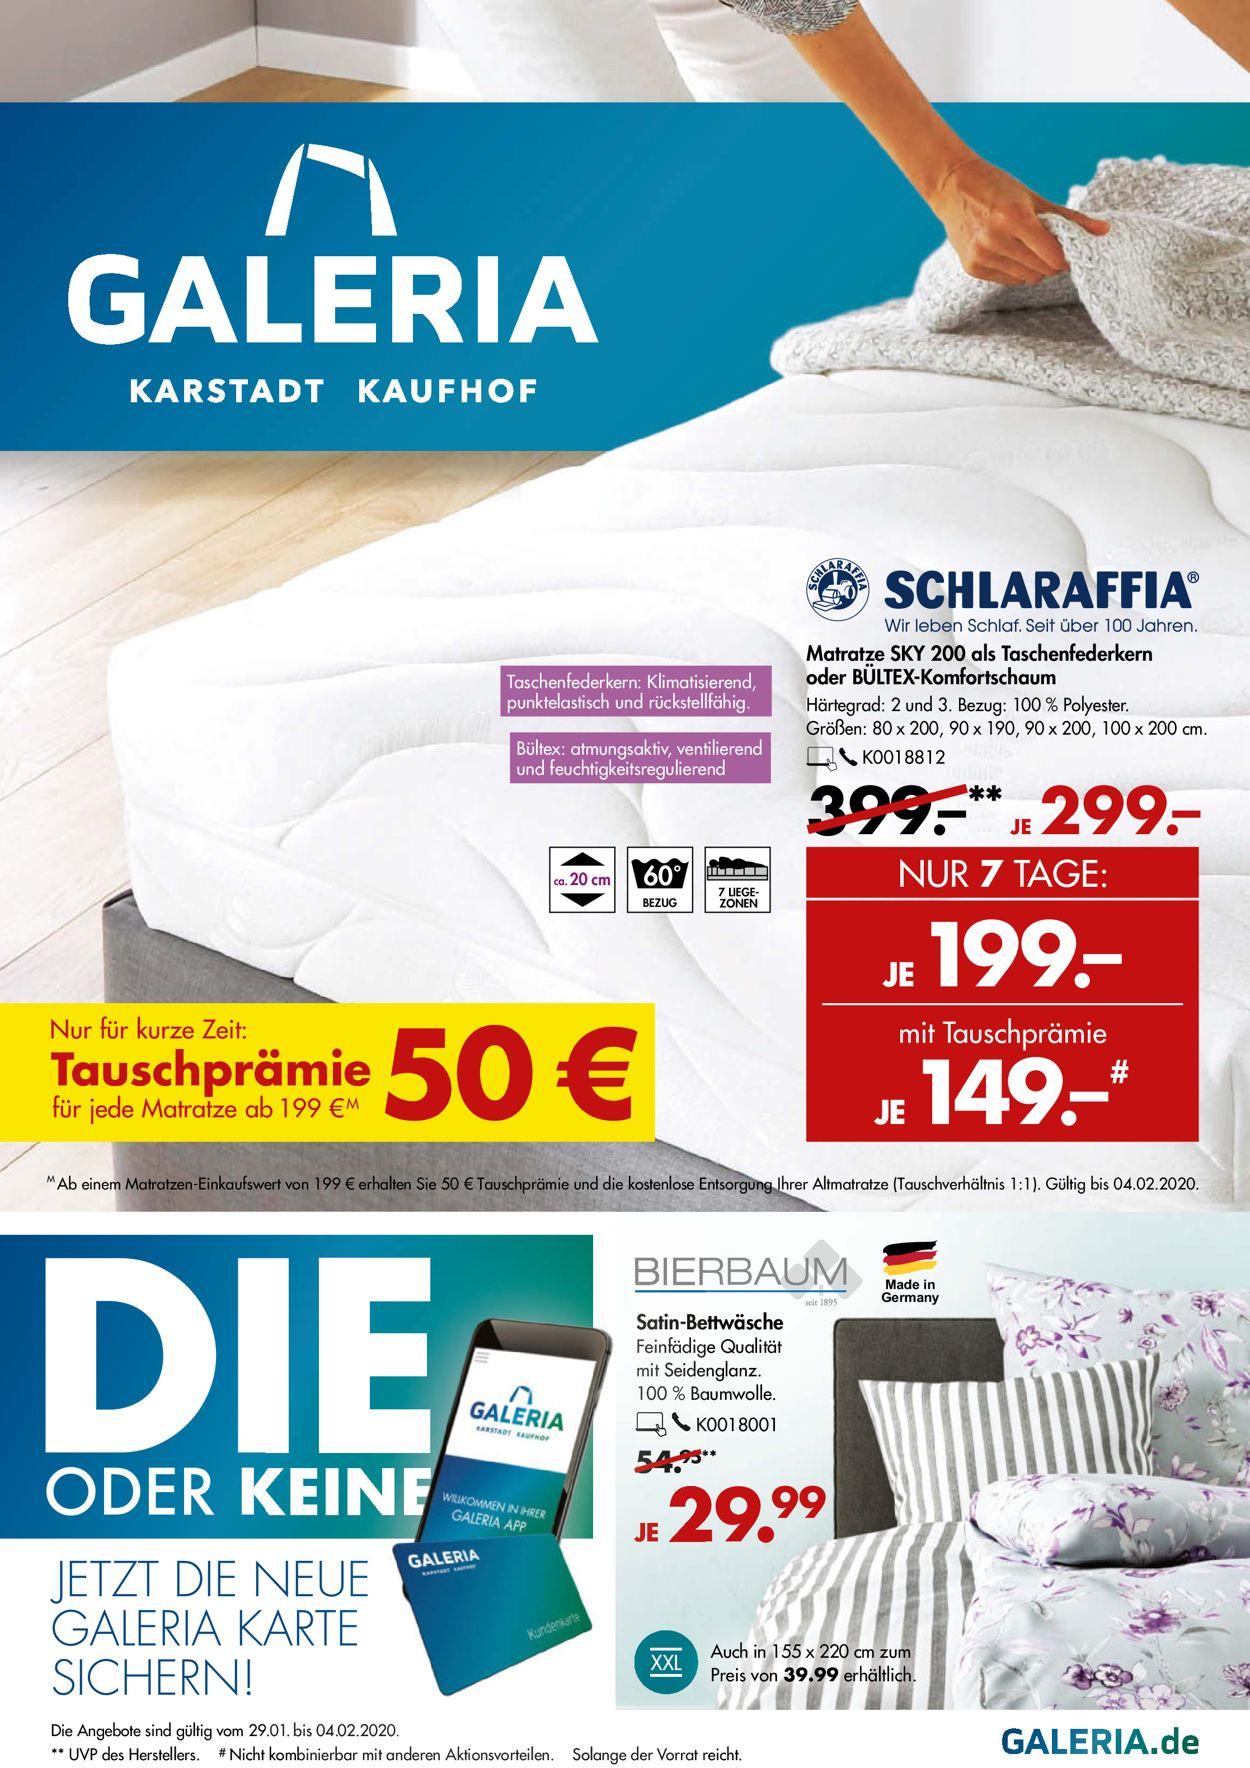 GALERIA Kaufhof Prospekt - Aktuell vom 29.01-04.02.2020